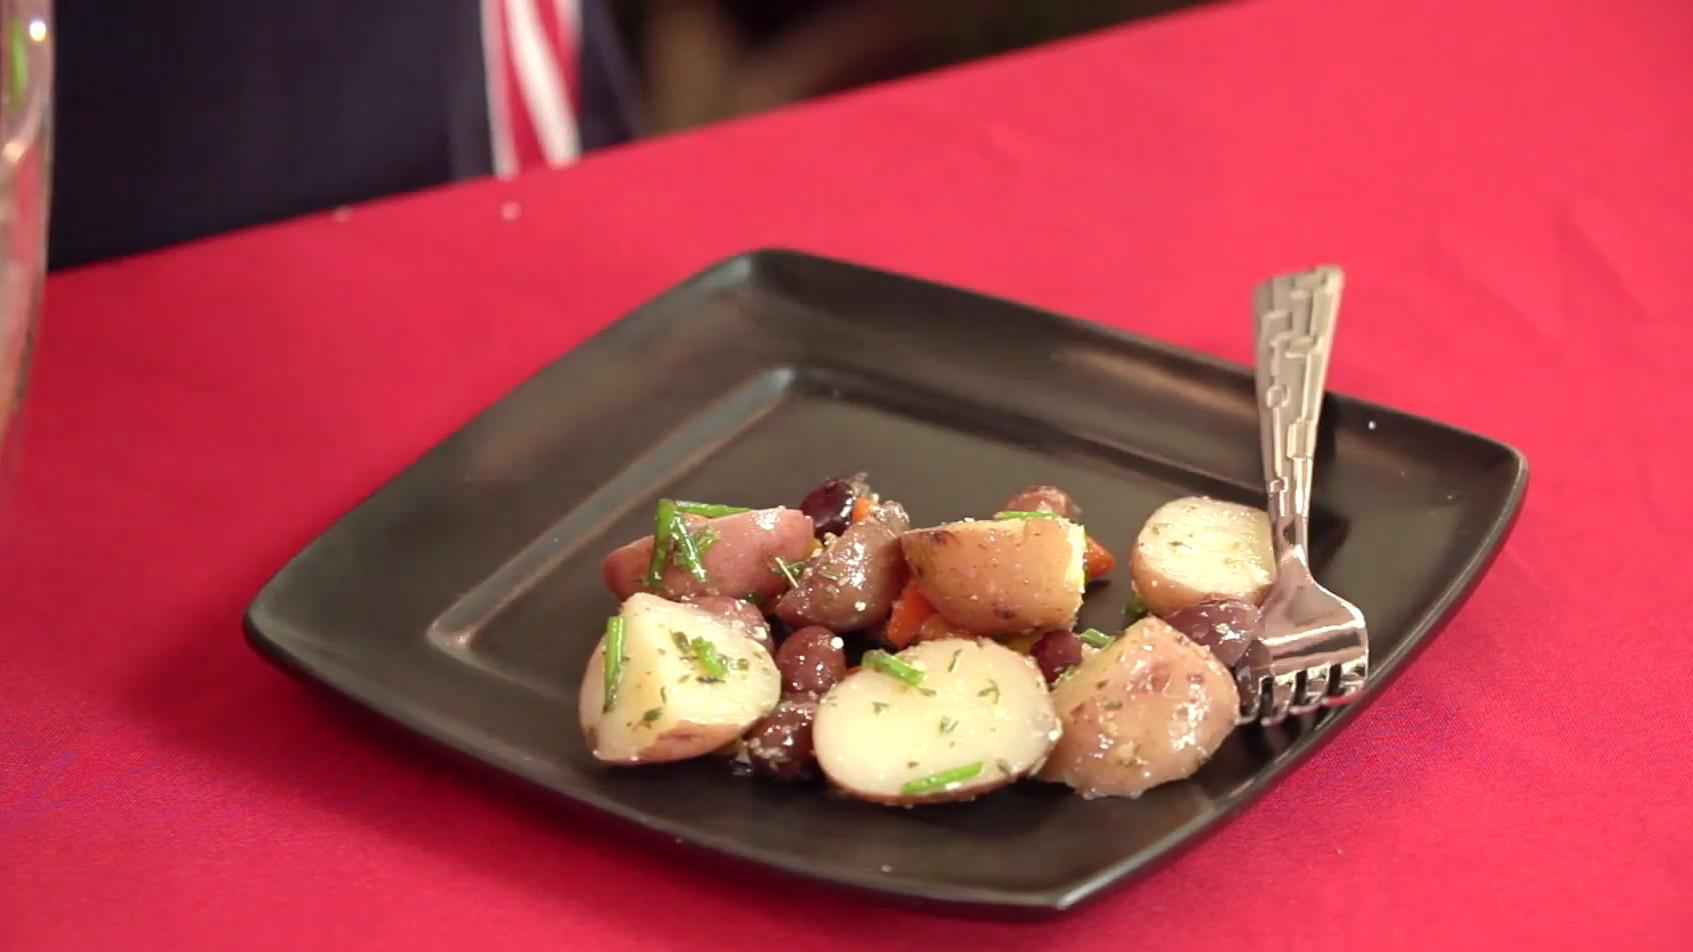 How to Make a Mediterranean Potato Salad